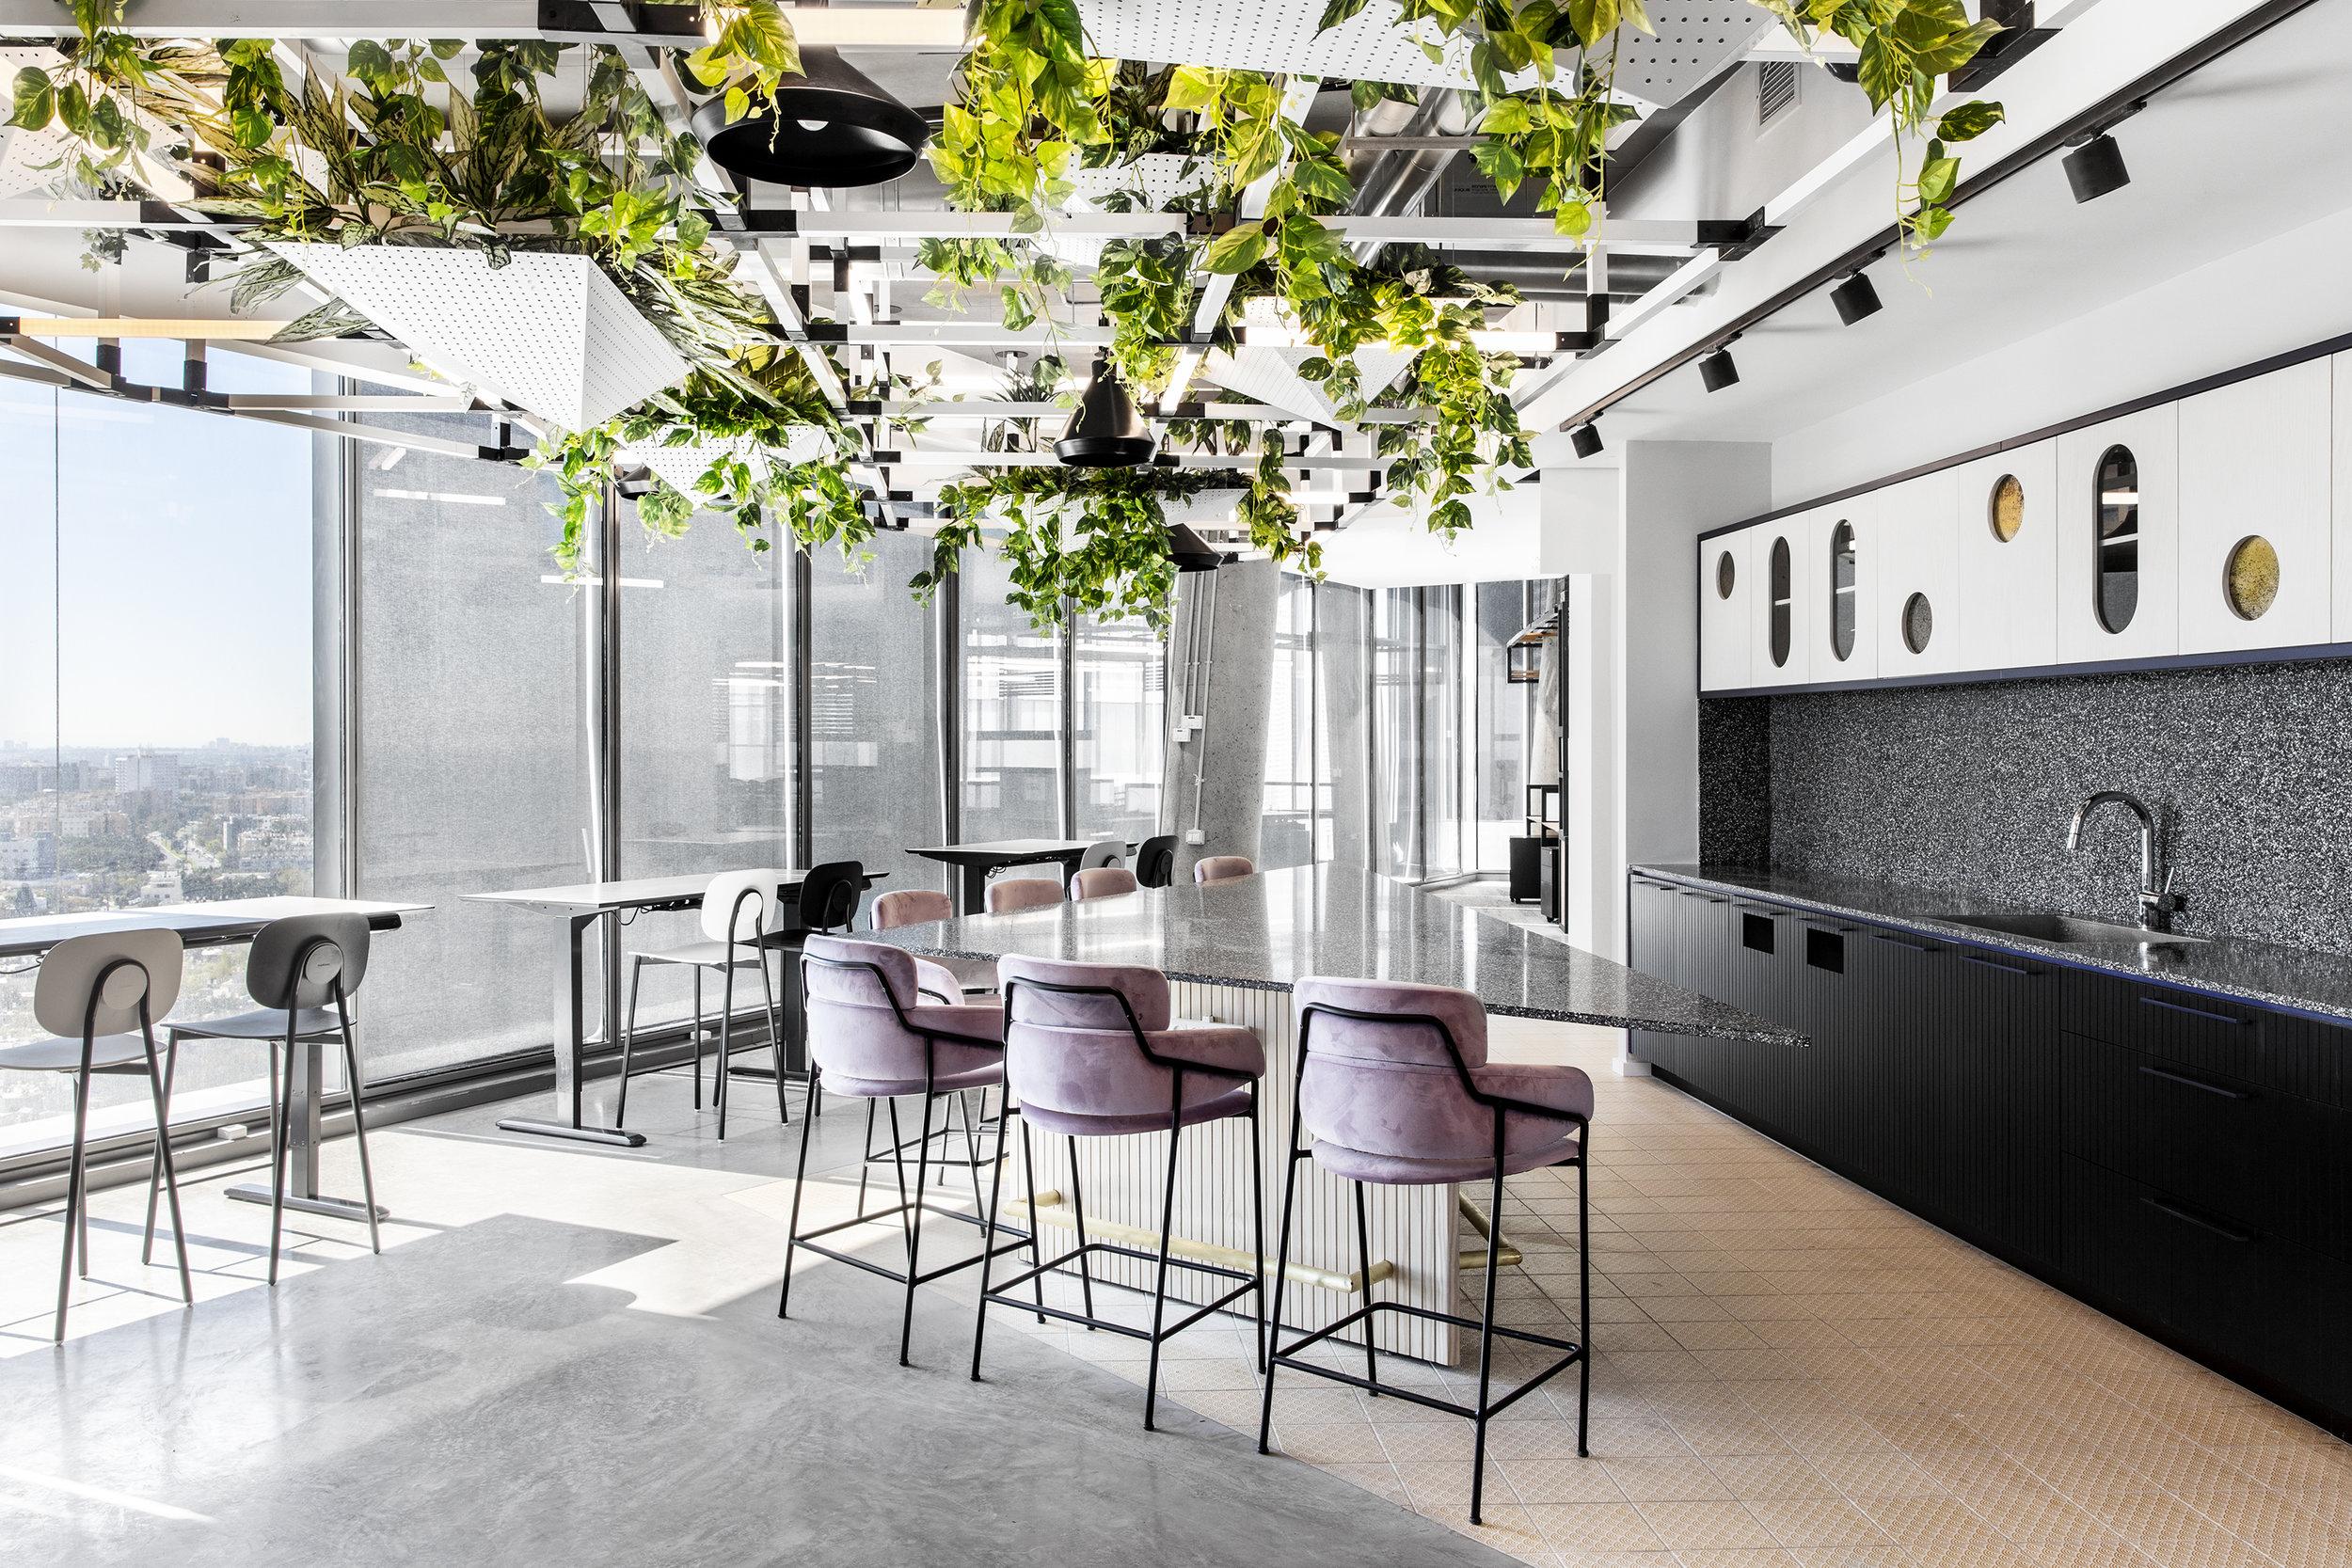 רואי דוד אדריכלות - אדריכל - נטורל אינטליג'נס - ROY DAVID - ARCHITECTURE - ARCHITECT - NI (2).jpg